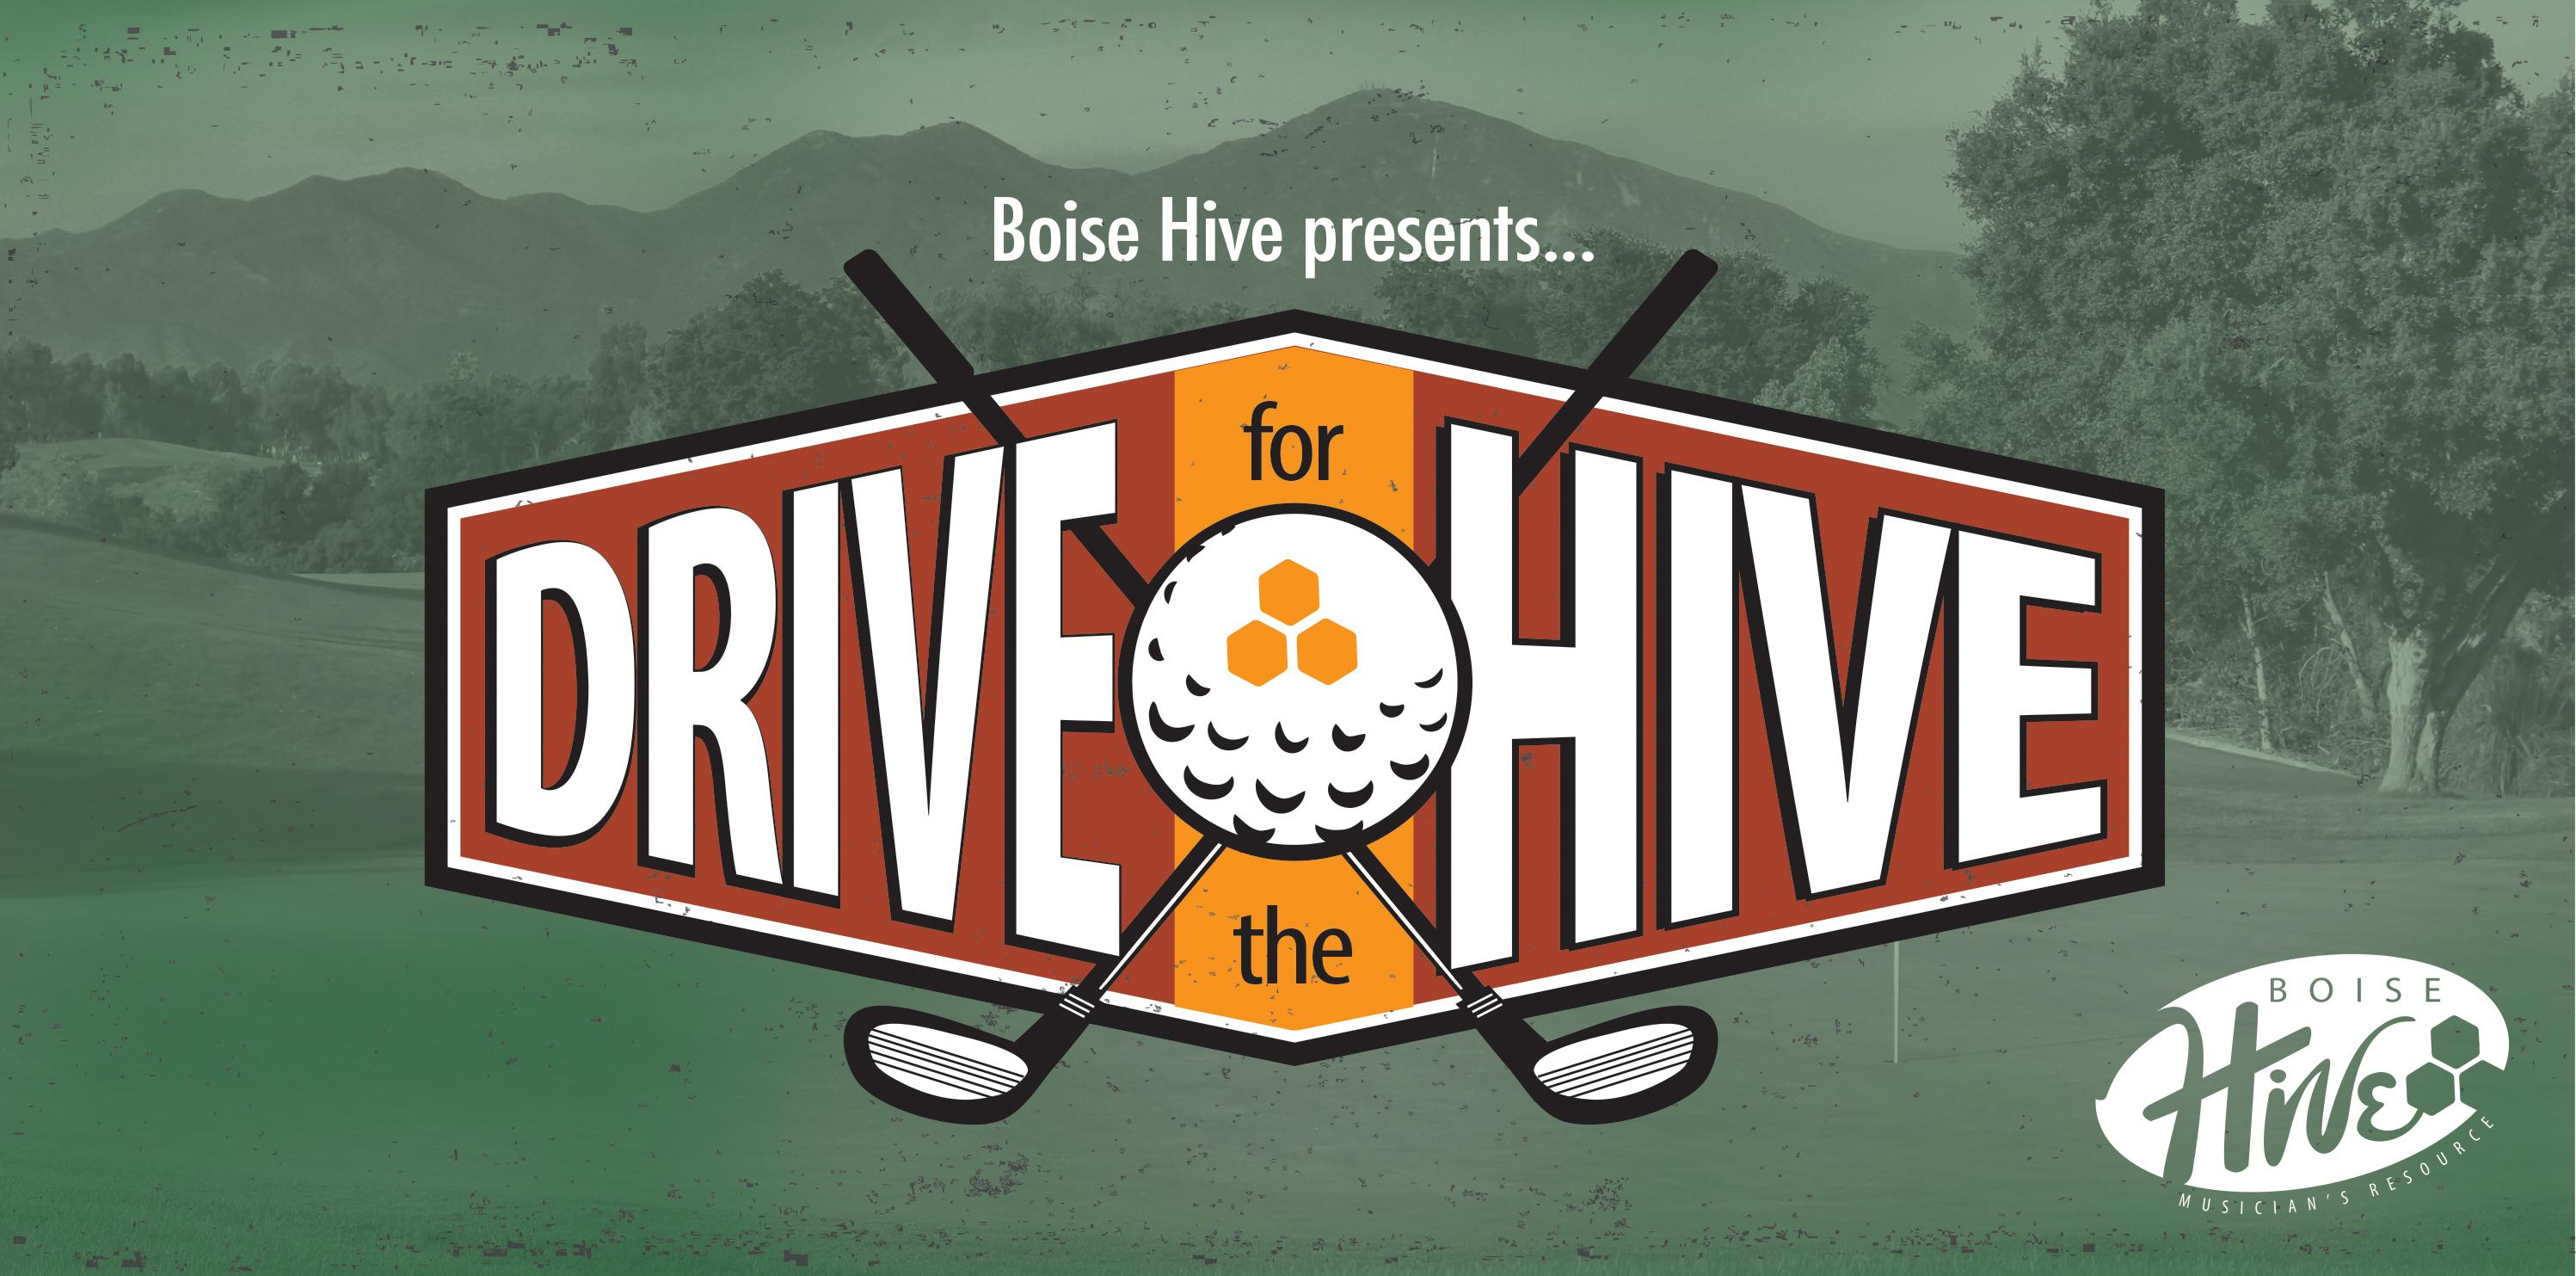 2019 Drive For The Hive Annual Golf Scramble